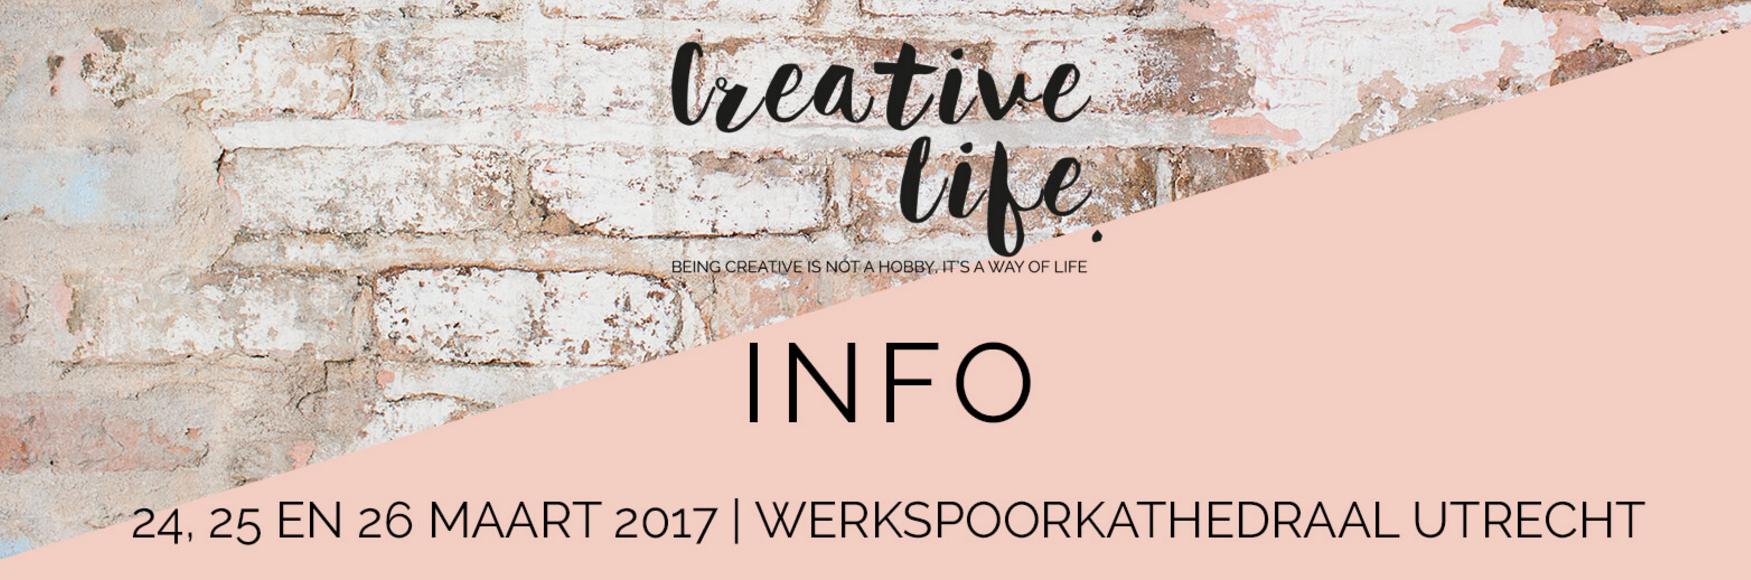 Creative Life Event 24-26 maart 2017